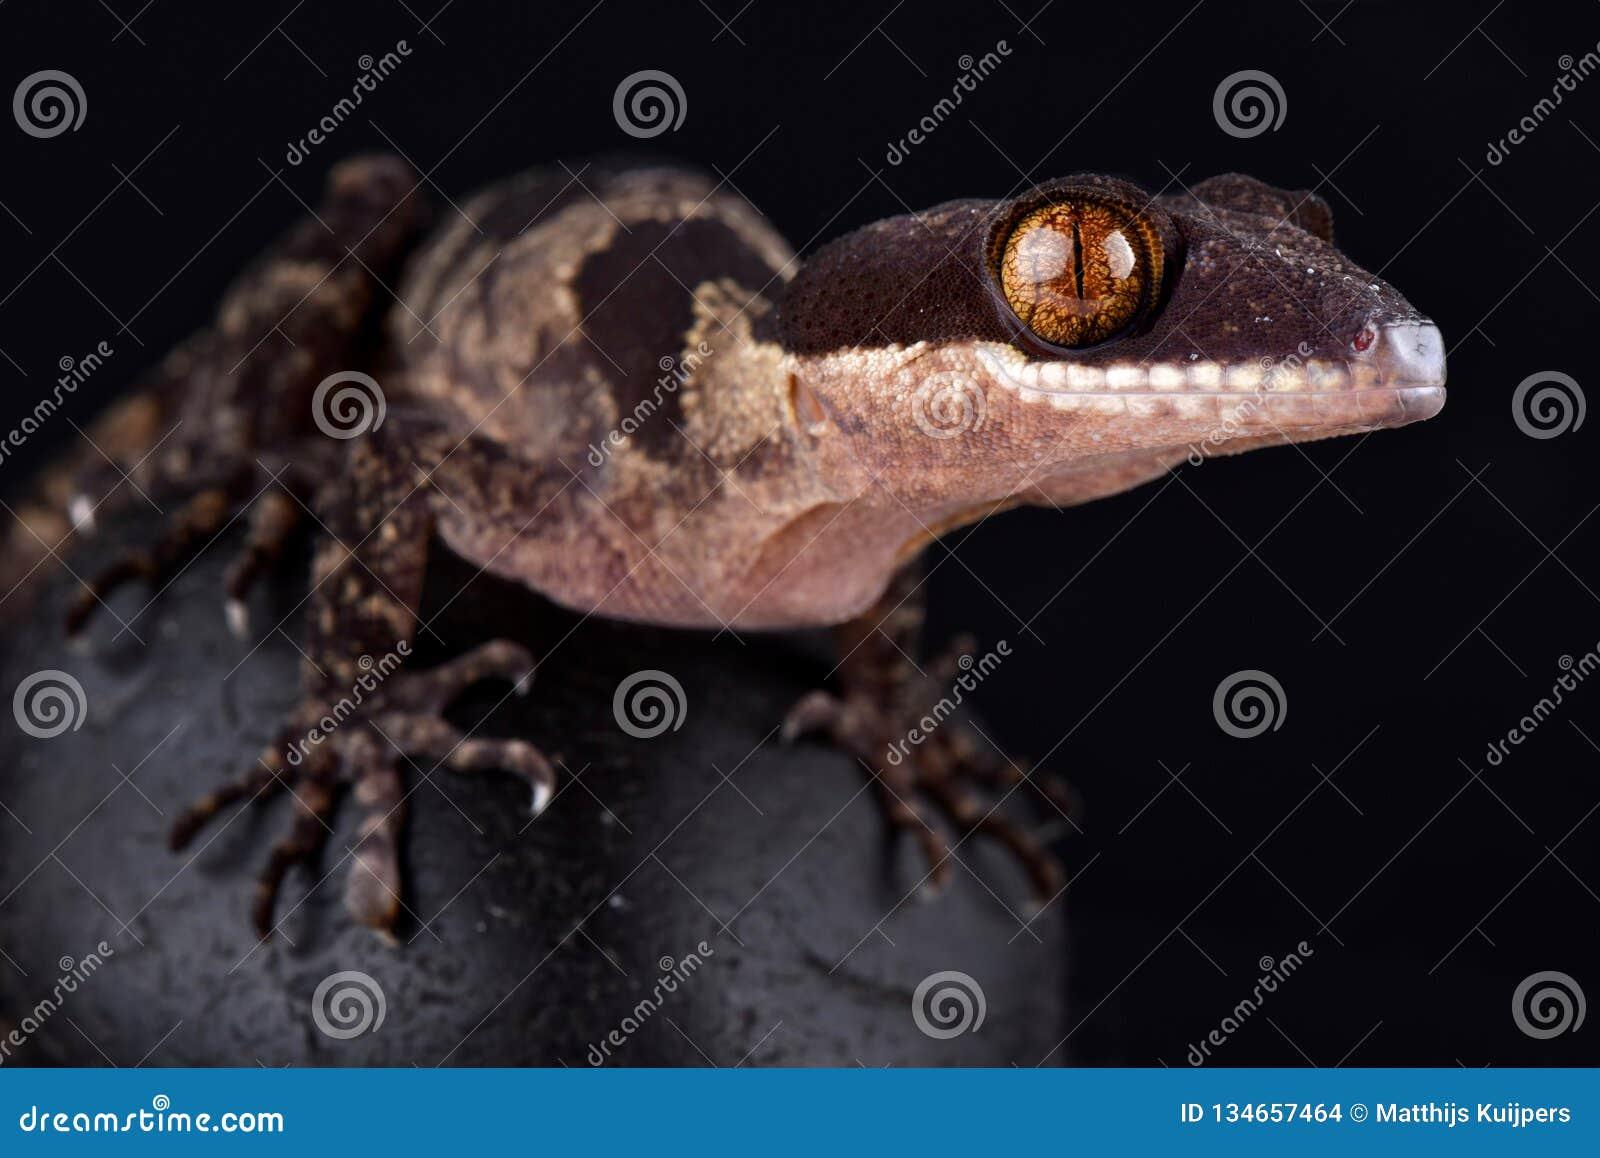 Papua giant banded gecko Cyrtodactylus louisiadensis